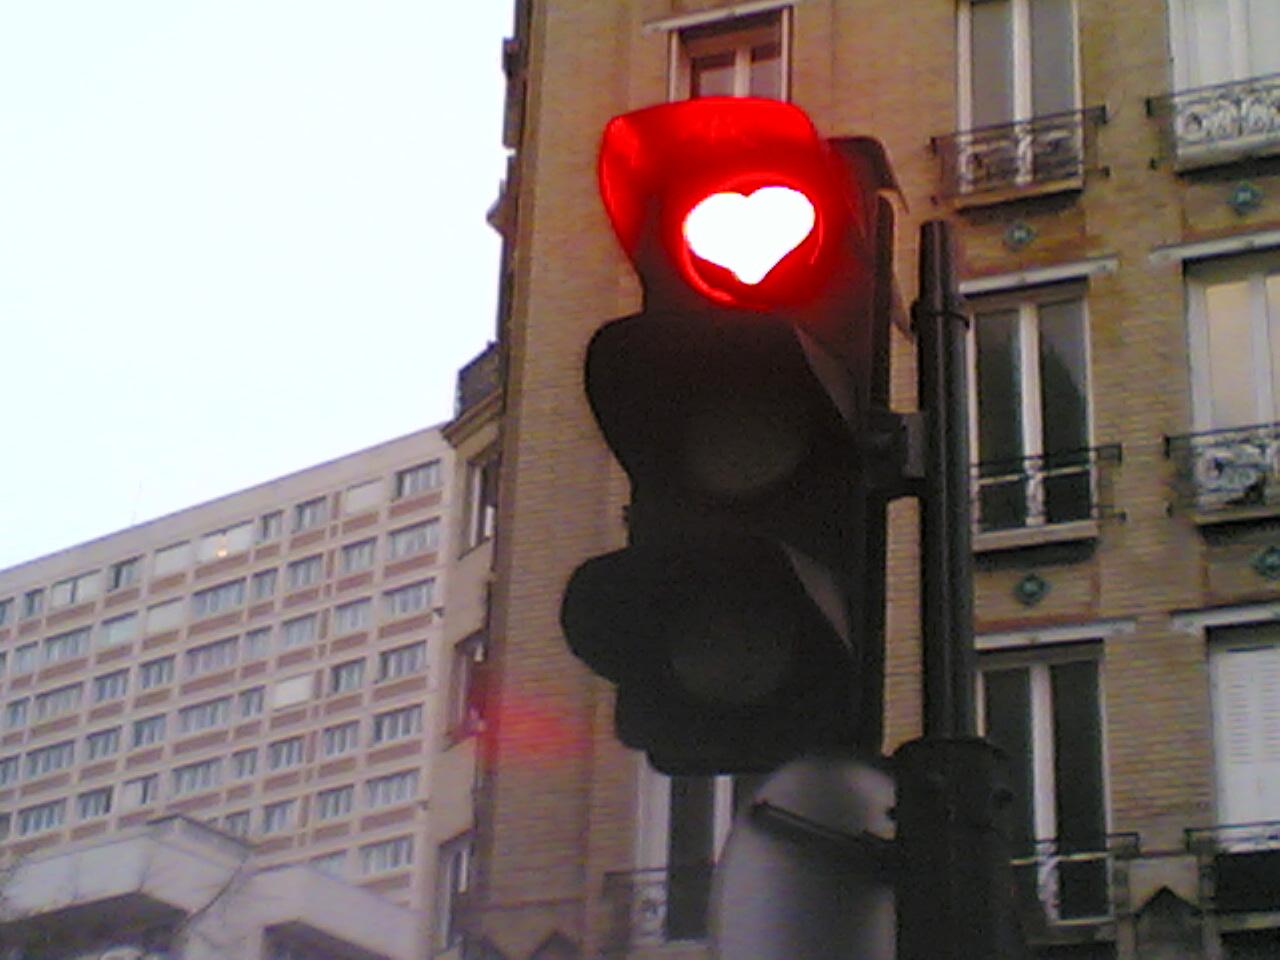 ��� ��� ��� ������ ������ �� ��� ������� ��� �� ��� ���� ��� �������� Stop!_I_love_you.jpg